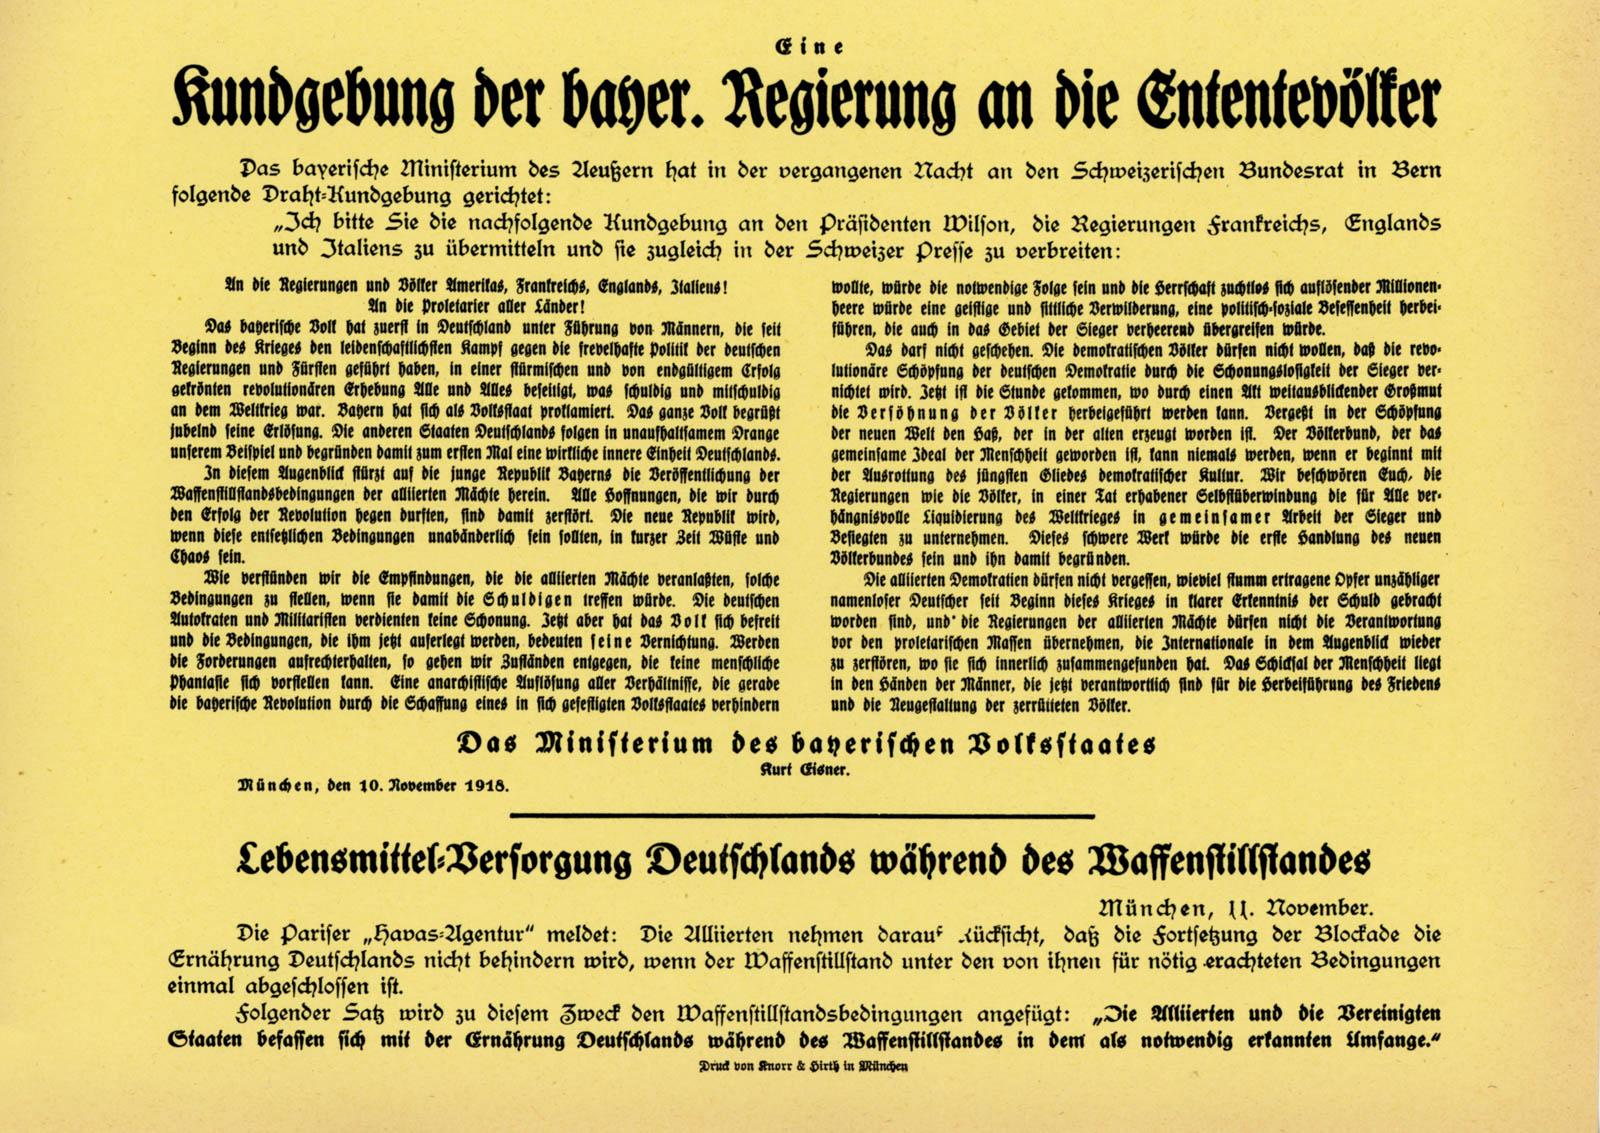 Kundgebung der bayer, Regierung an die Ententevölker